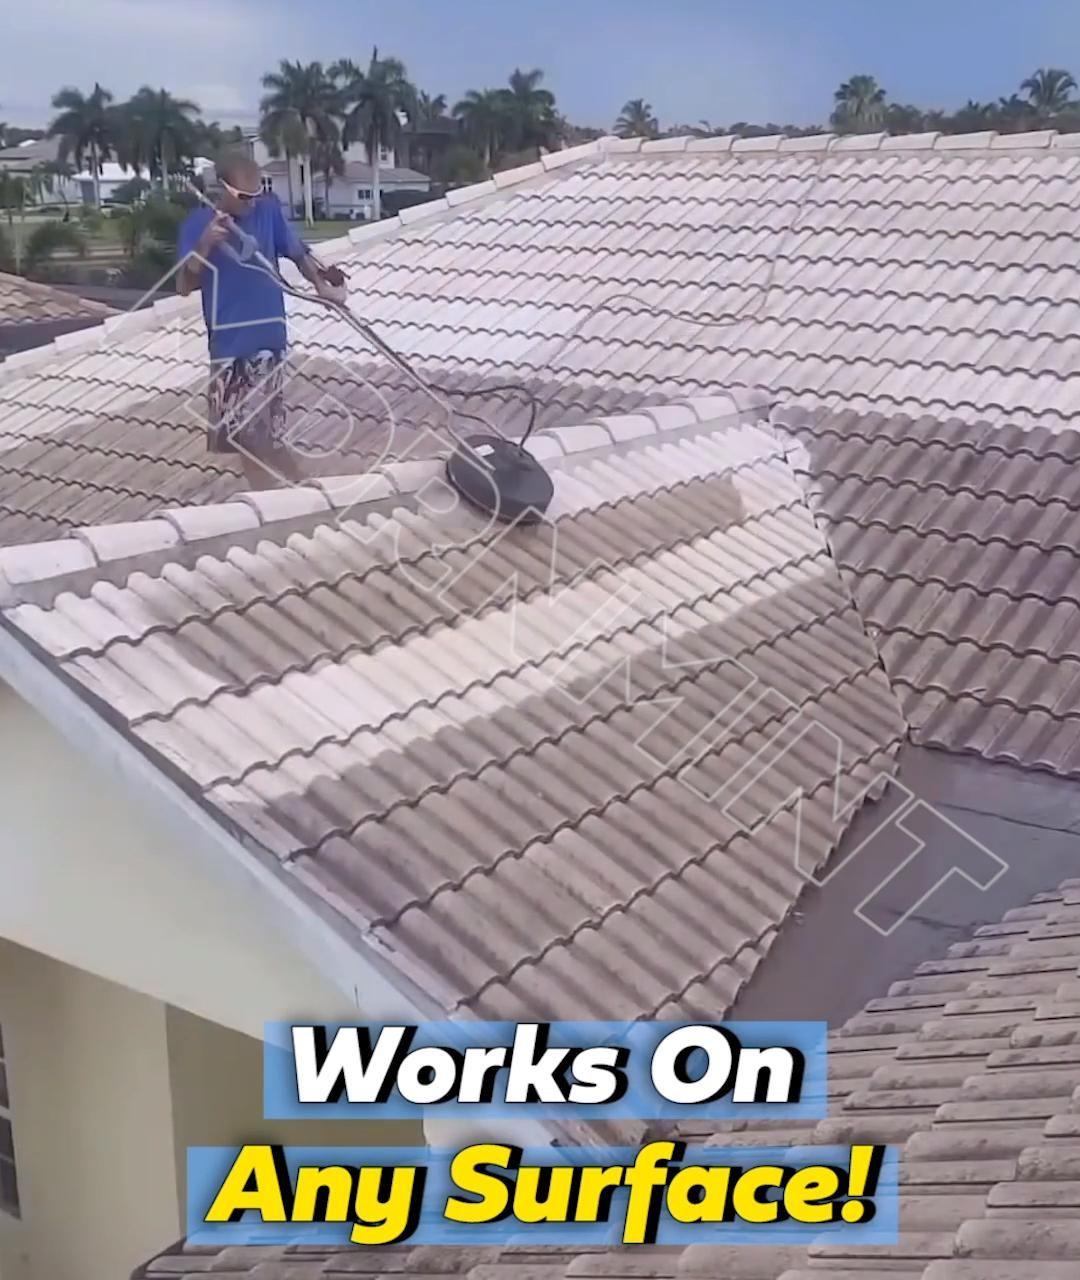 Hydromop Surface Cleaner Save Time Pressure Washing Video In 2020 Backyard Useful Life Hacks Diy Home Repair